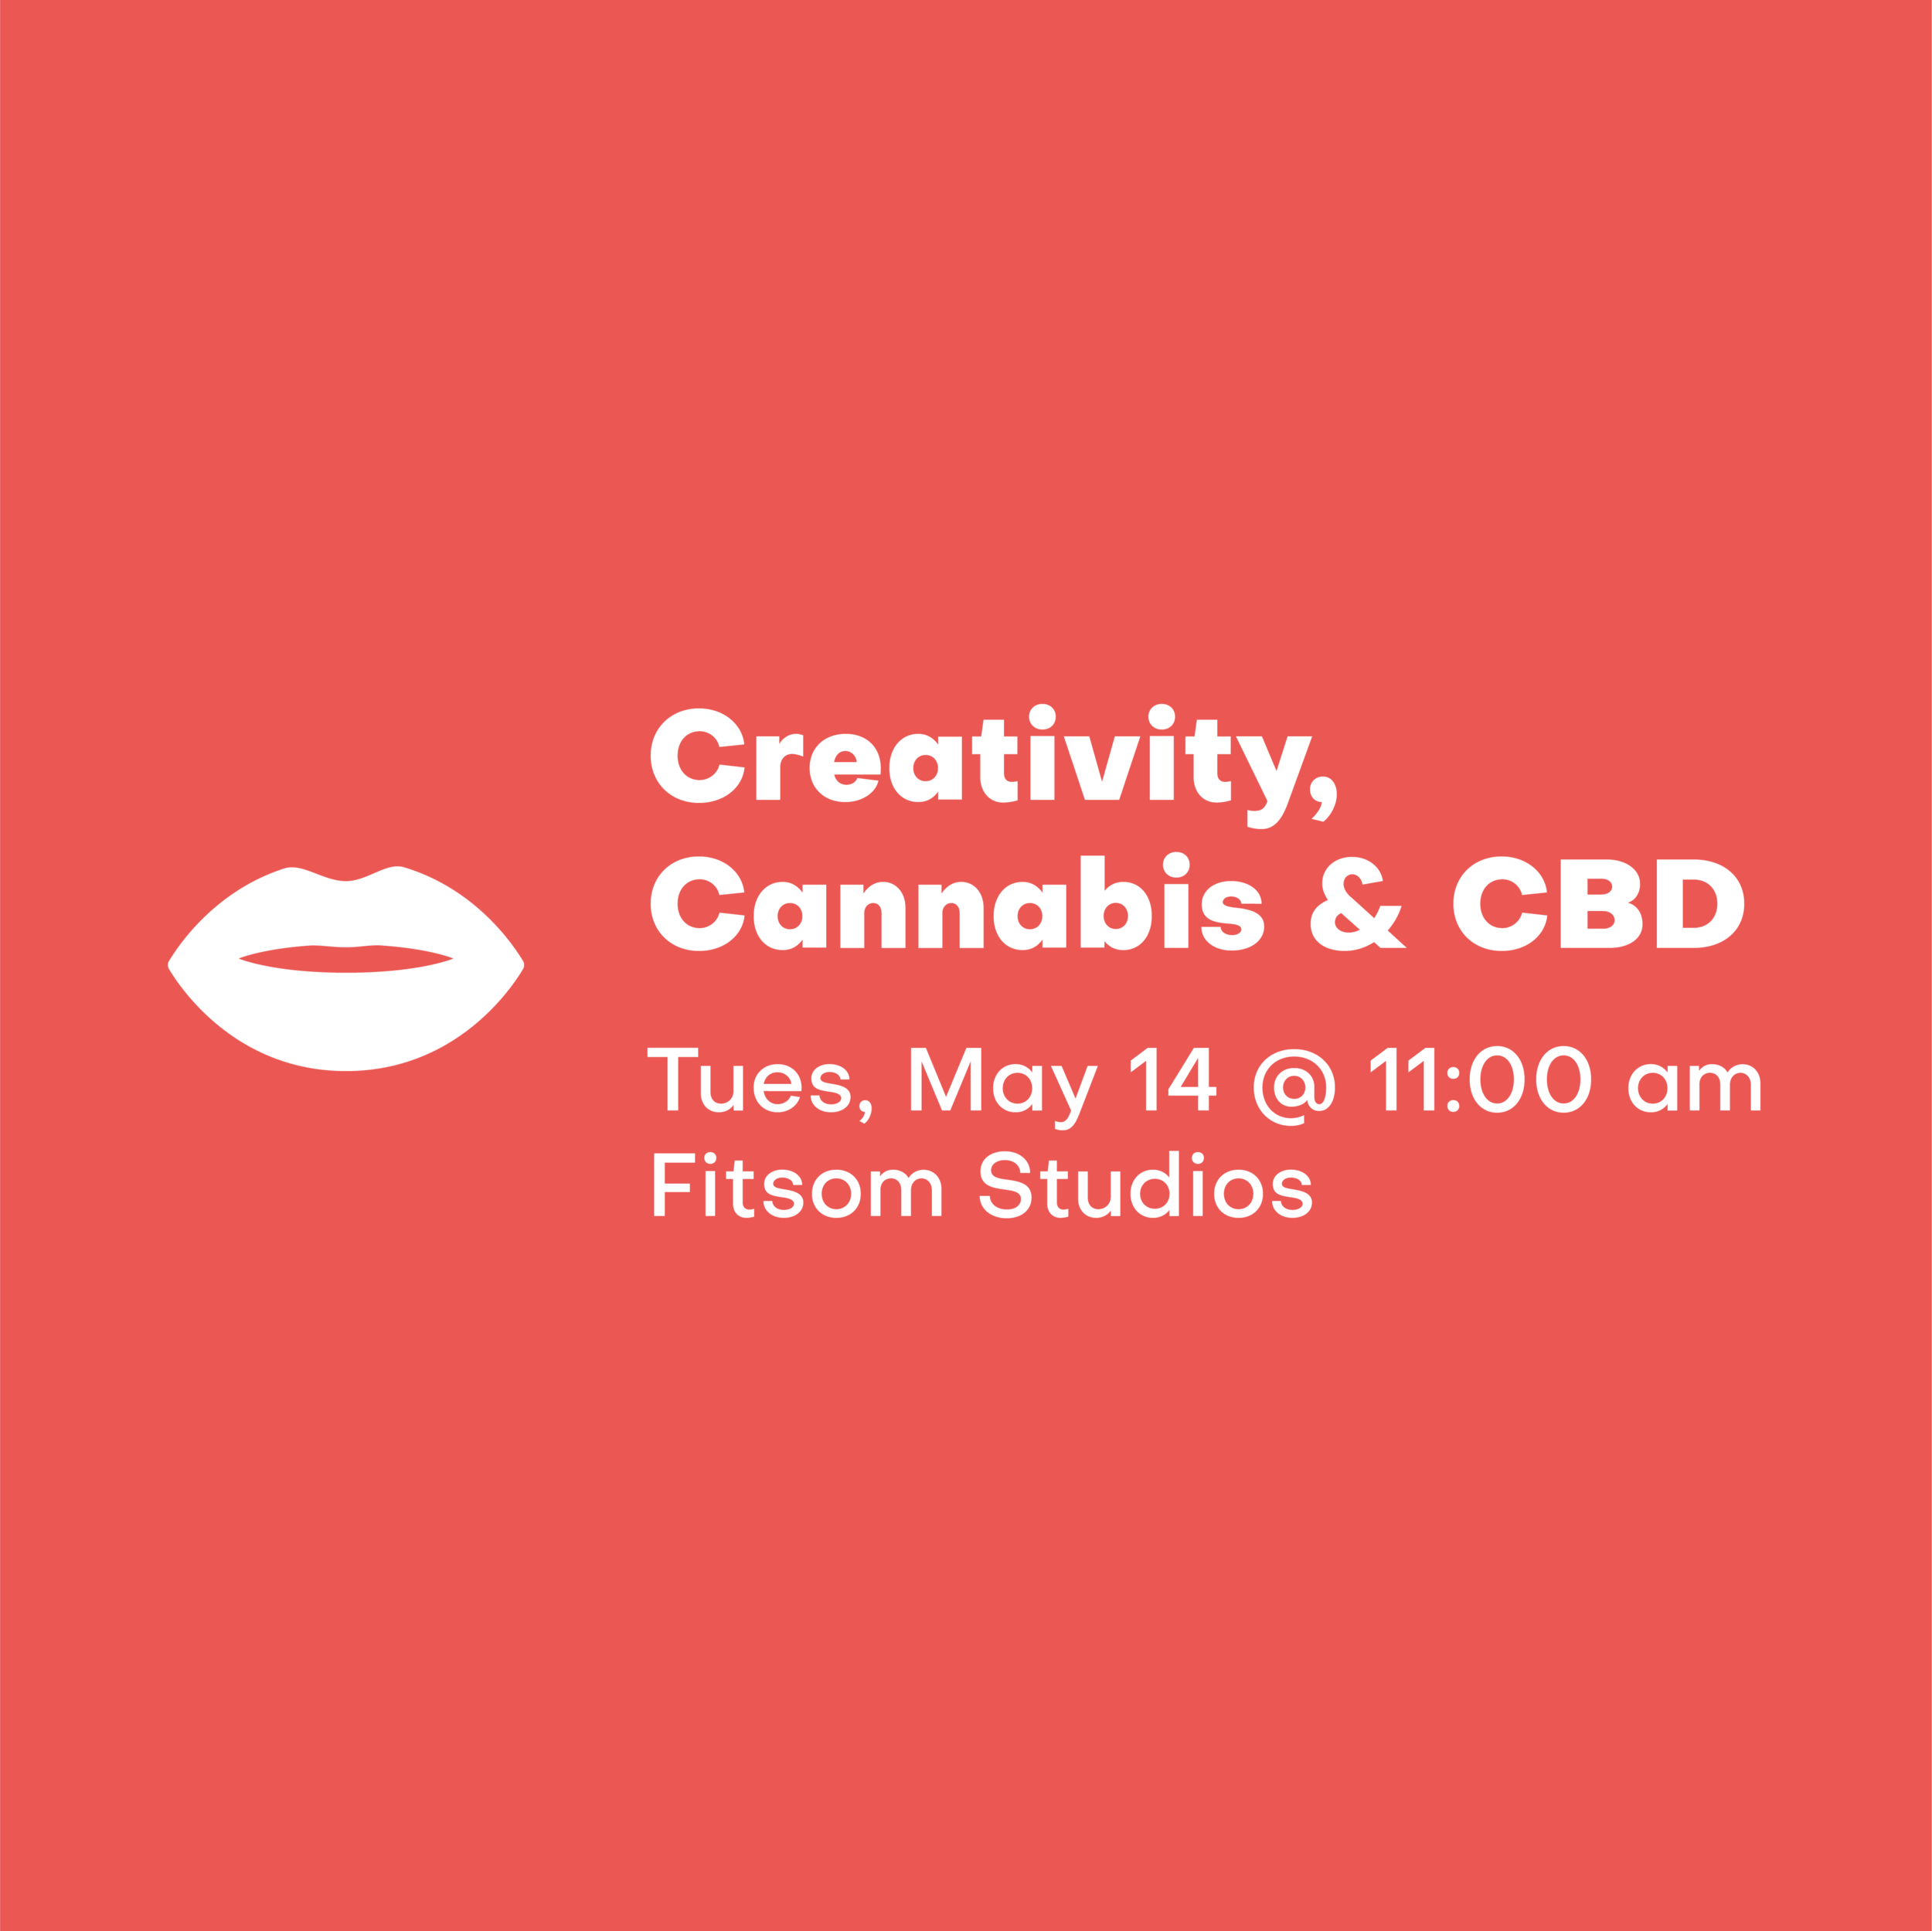 Cannabis, Creativity & CBD-02.png